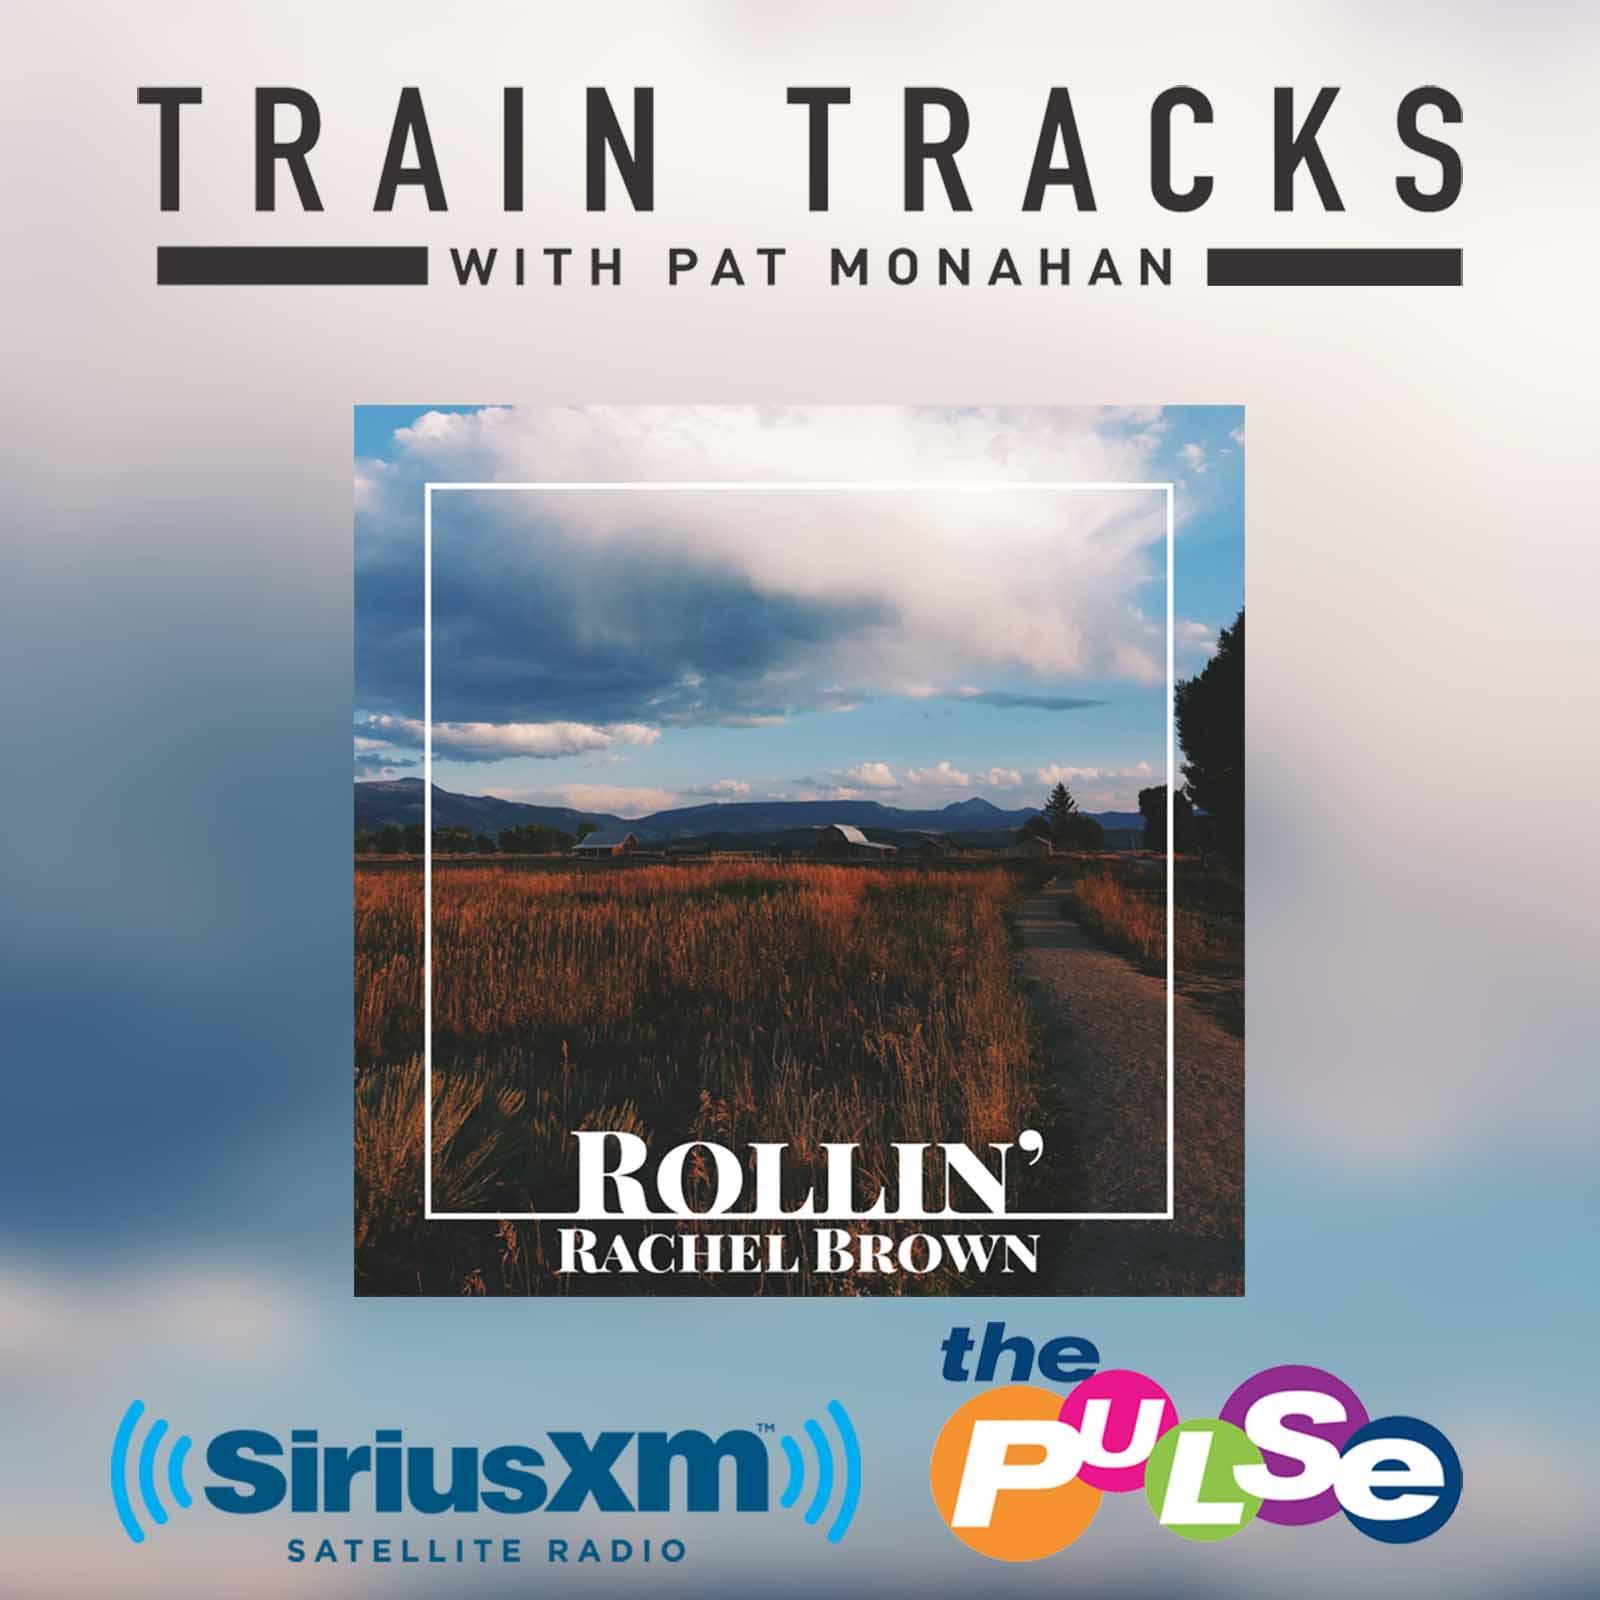 Rollin' on Train Tracks